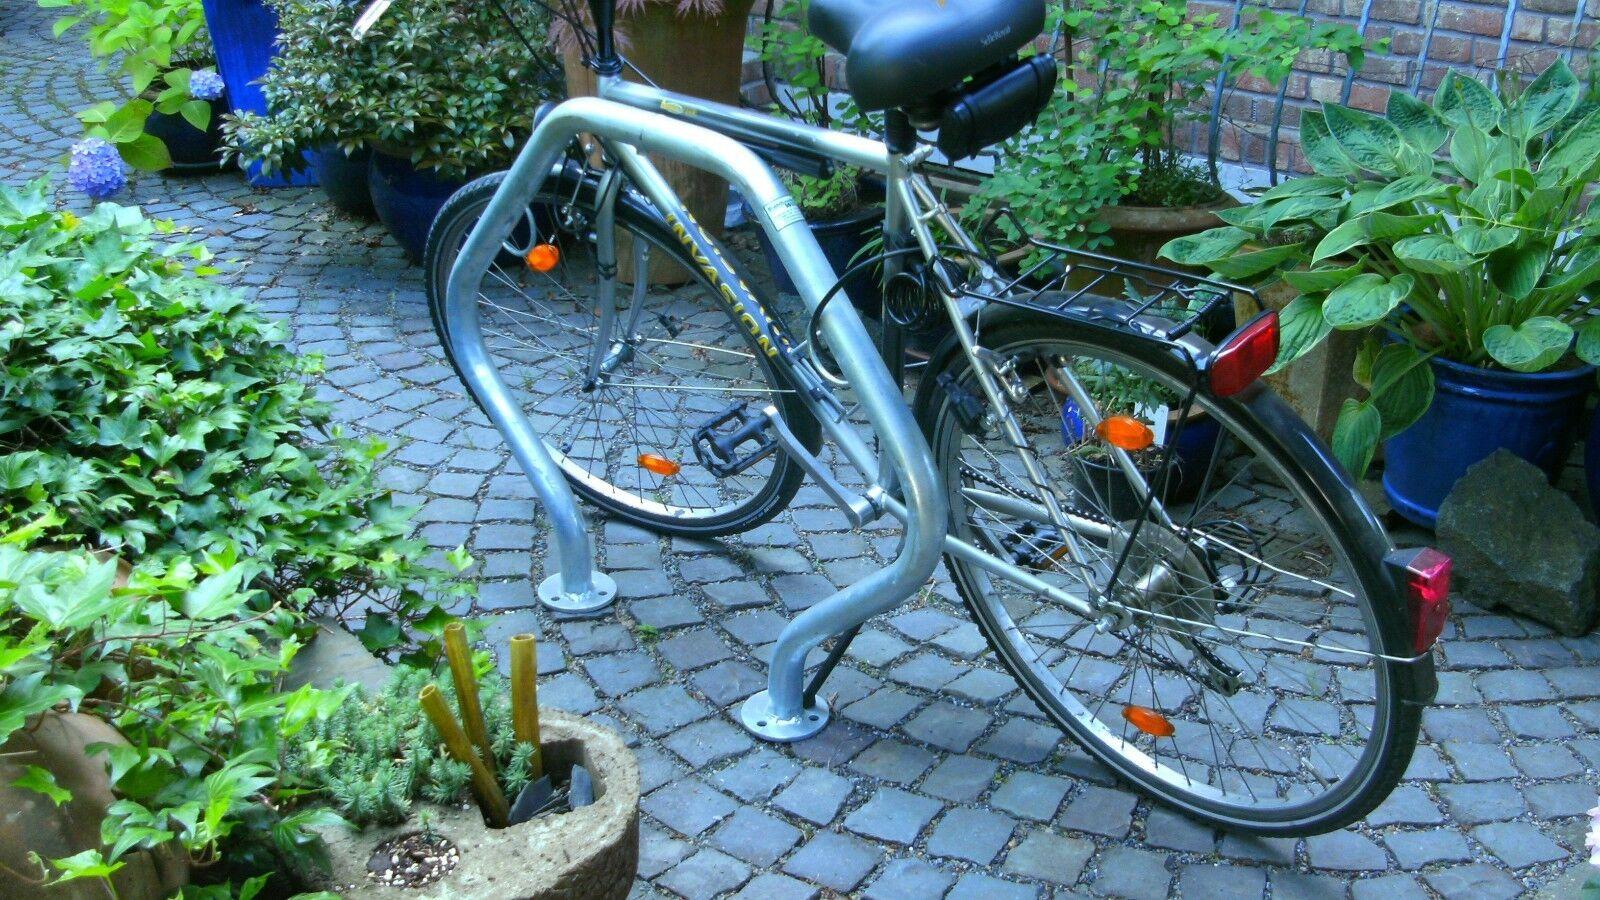 Bicicleta 2 unid anlehnparker  stk. bolardo ciudad muebles abtrenner anlehnbügel